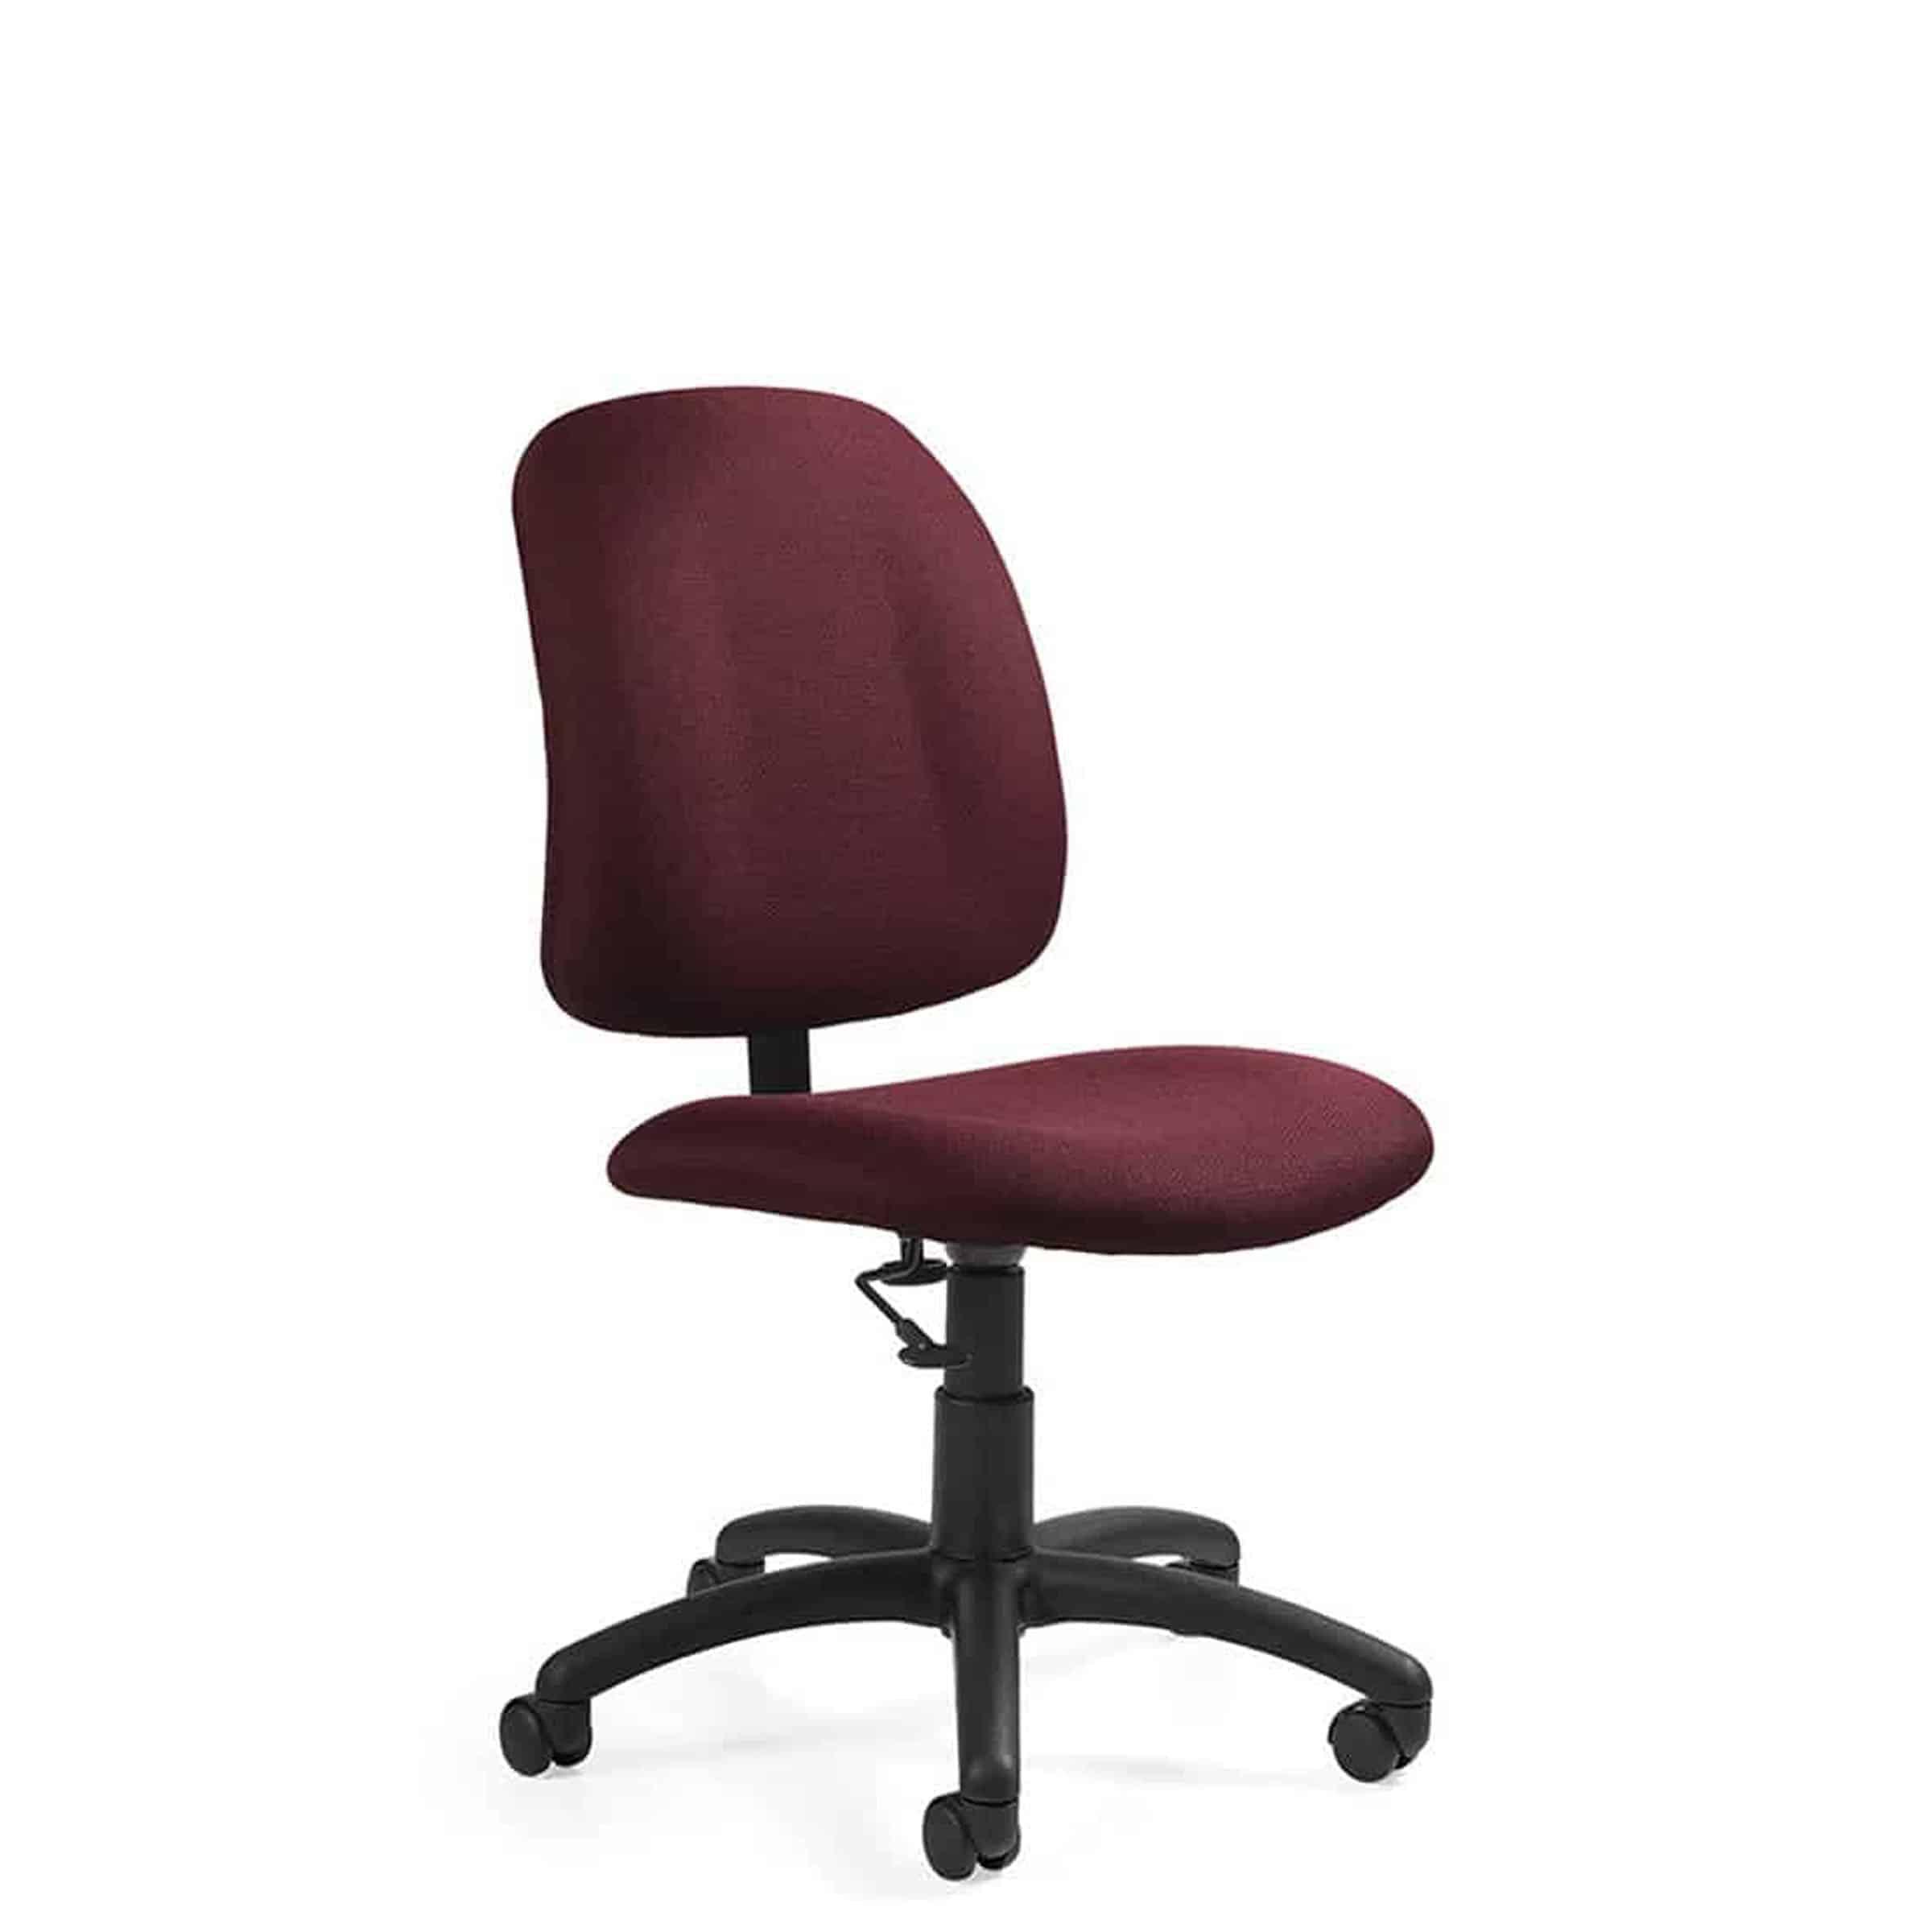 Global Goal chair